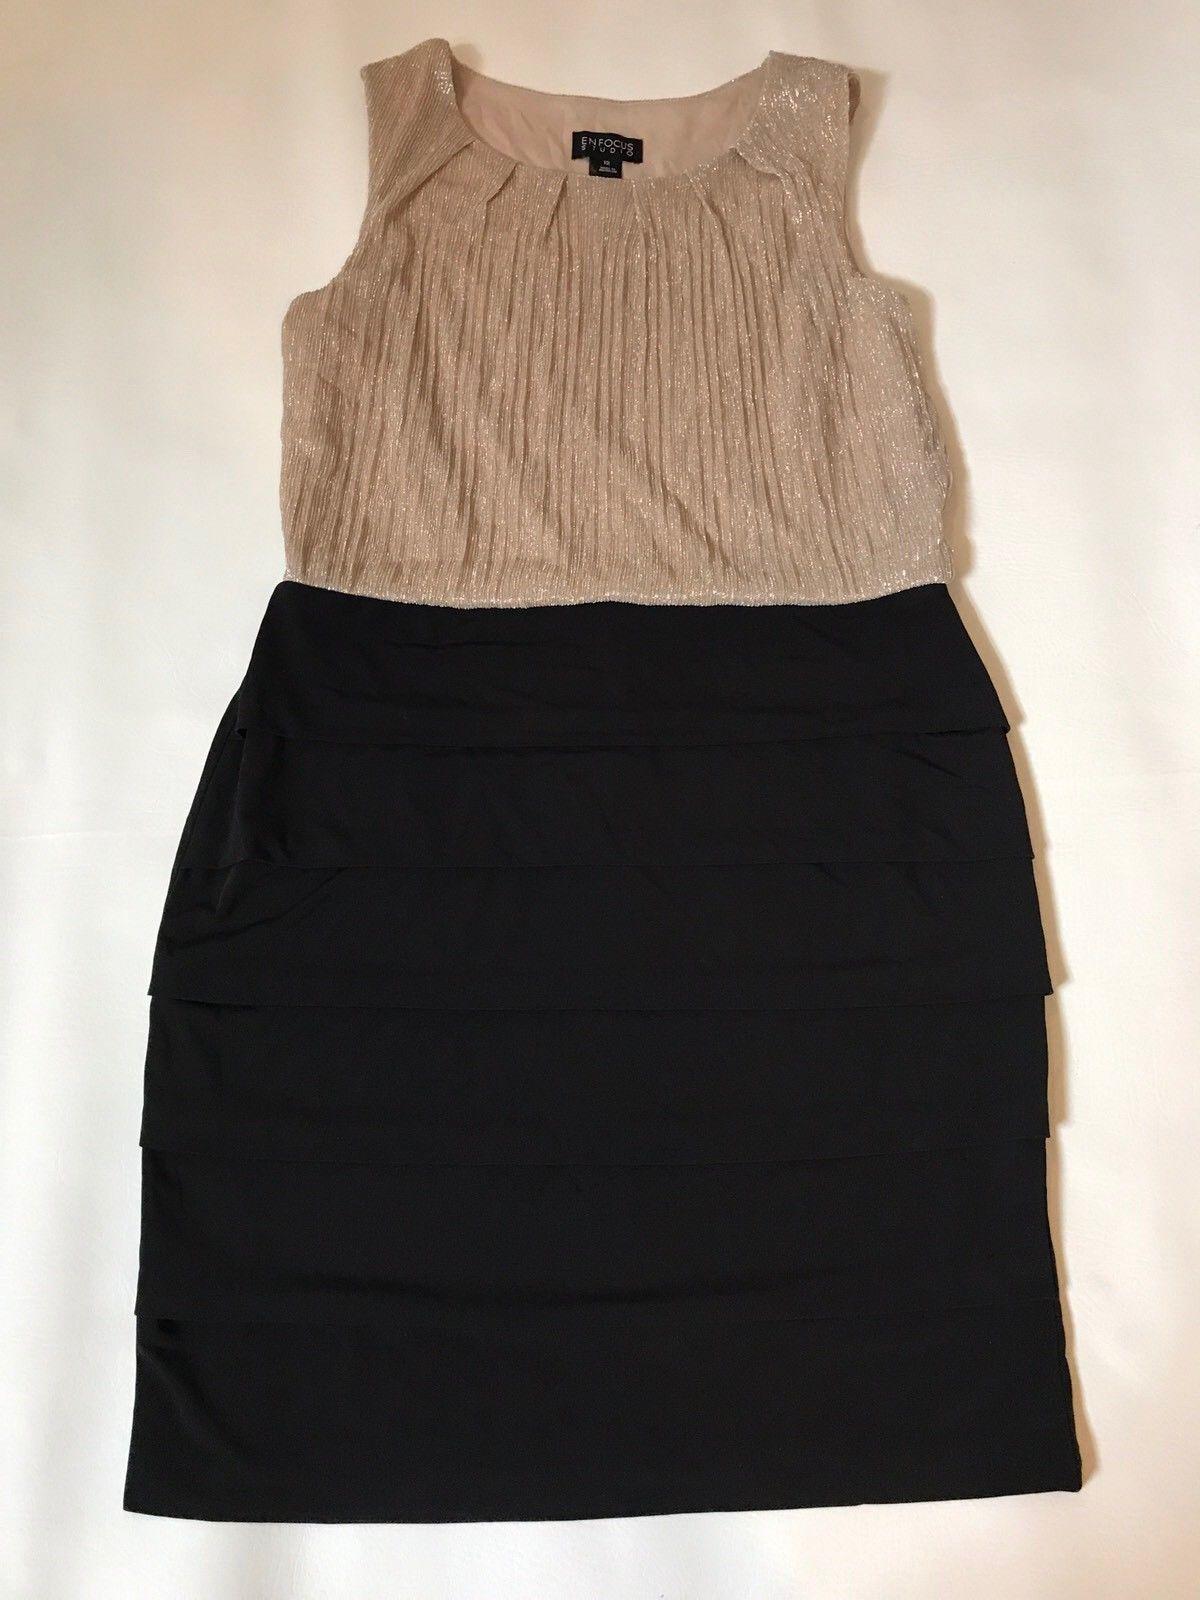 Awesome great womenus gold black shiny dress size large holiday